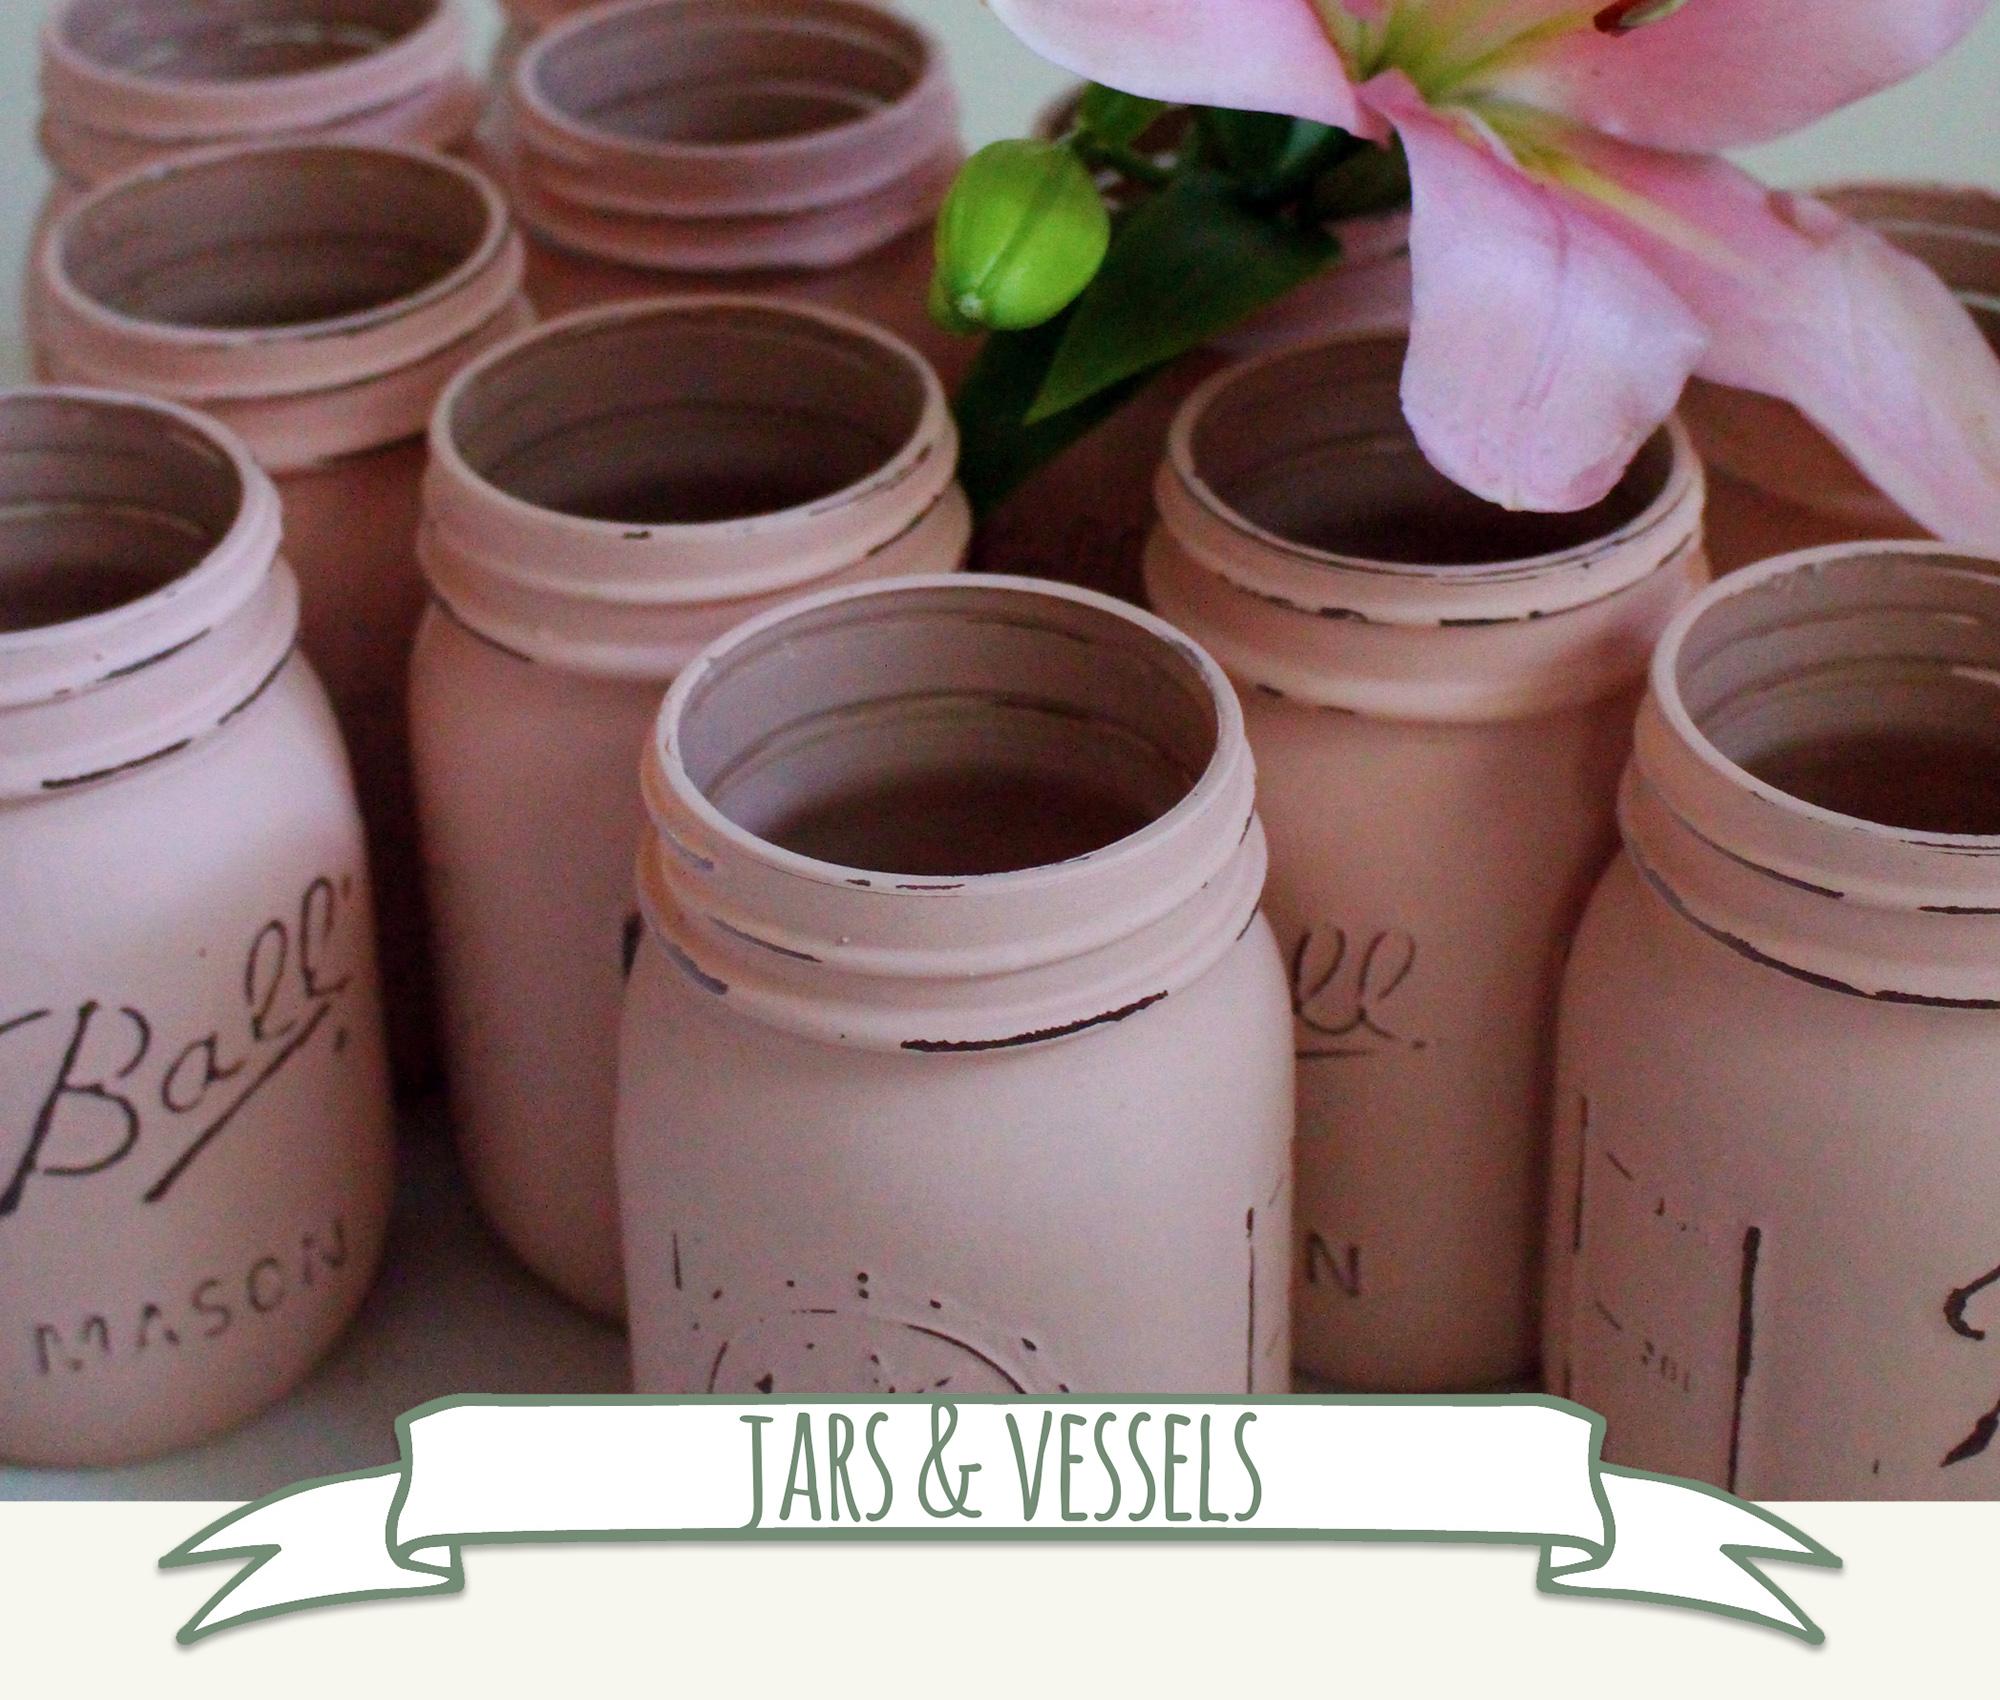 Jars & Vessels Button.jpg